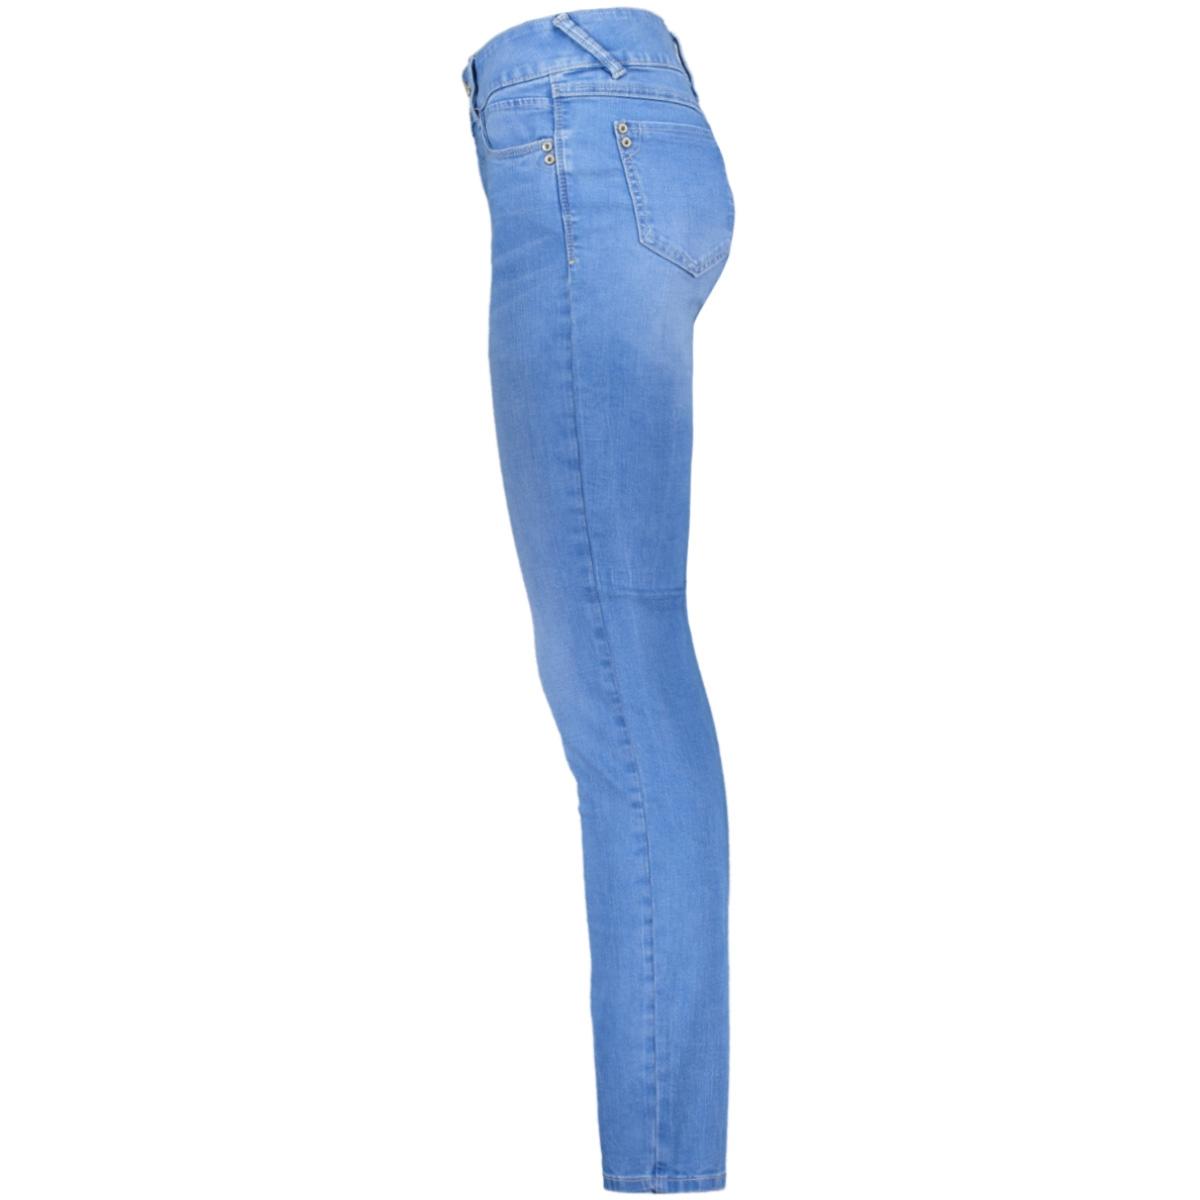 jeans 91005 geisha jeans blue denim bright